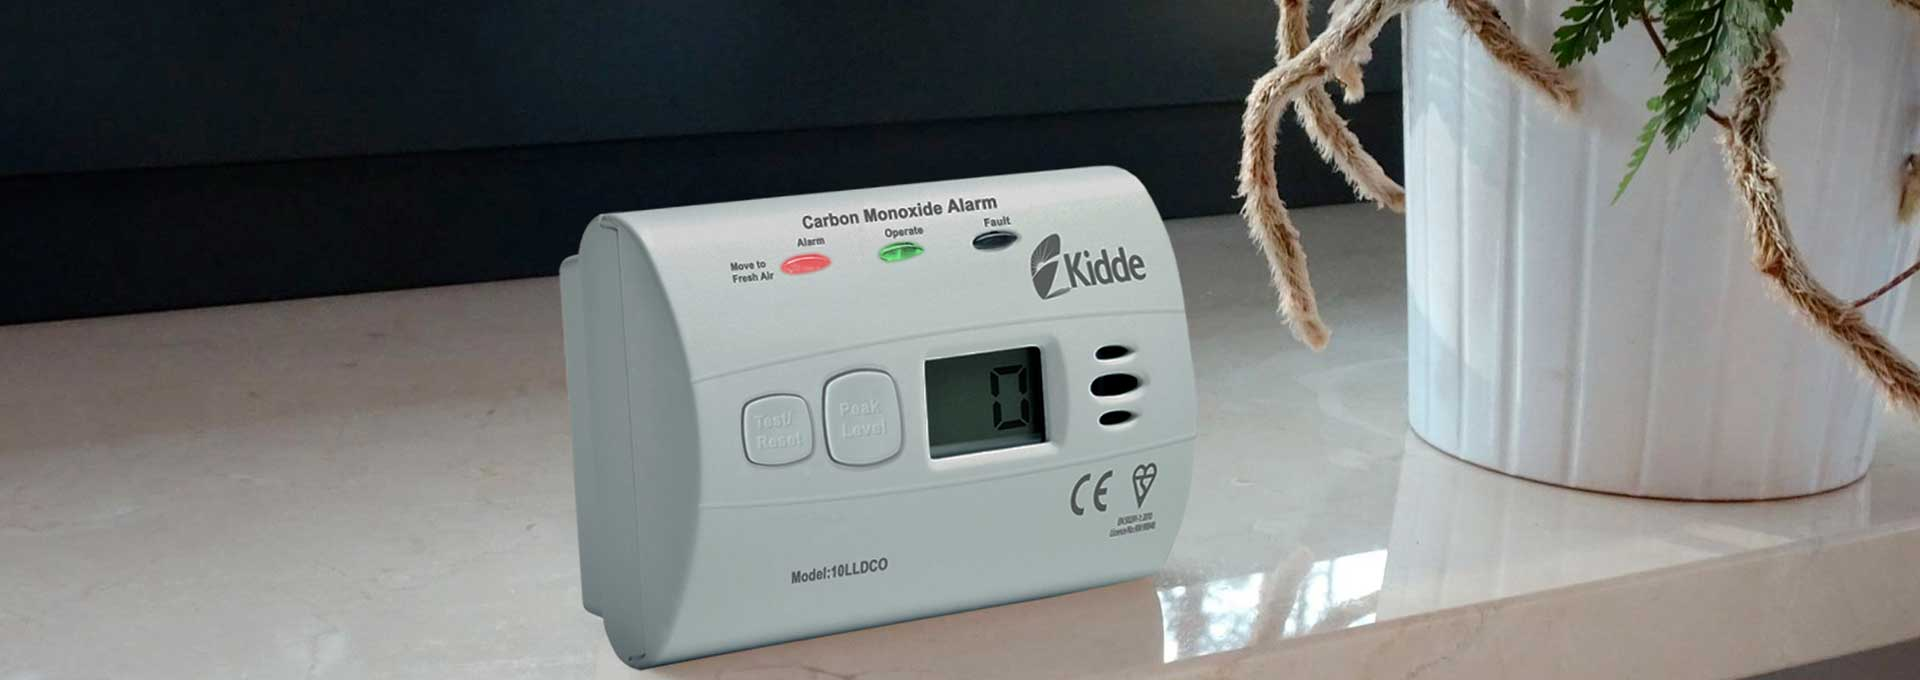 Detektor oxidu uhelnatého Kidde